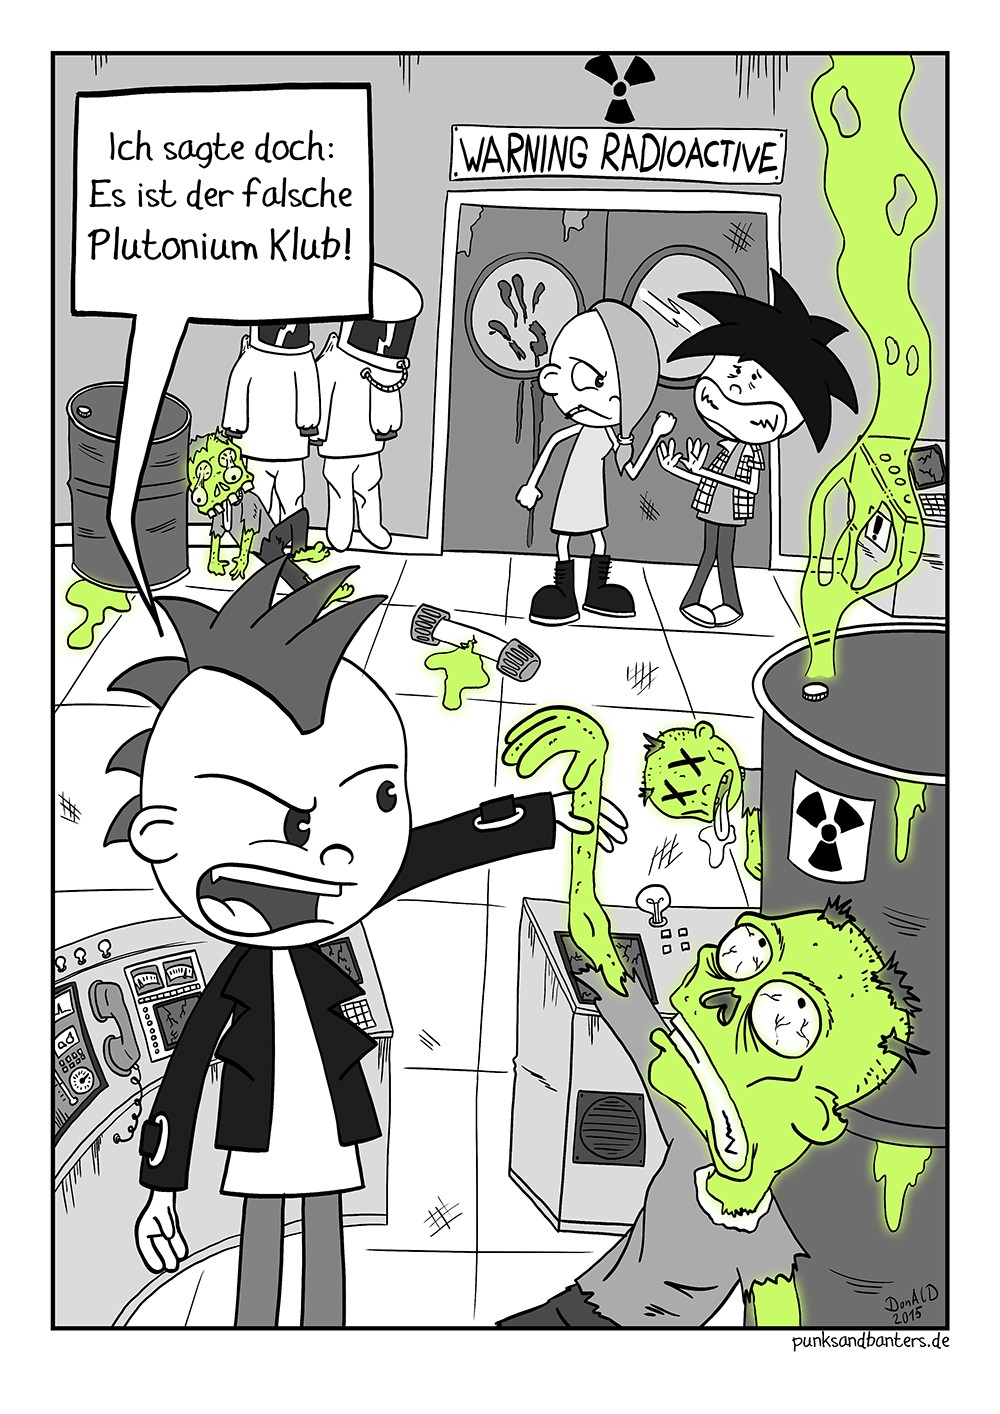 Willkommen im Plutonium-Klub